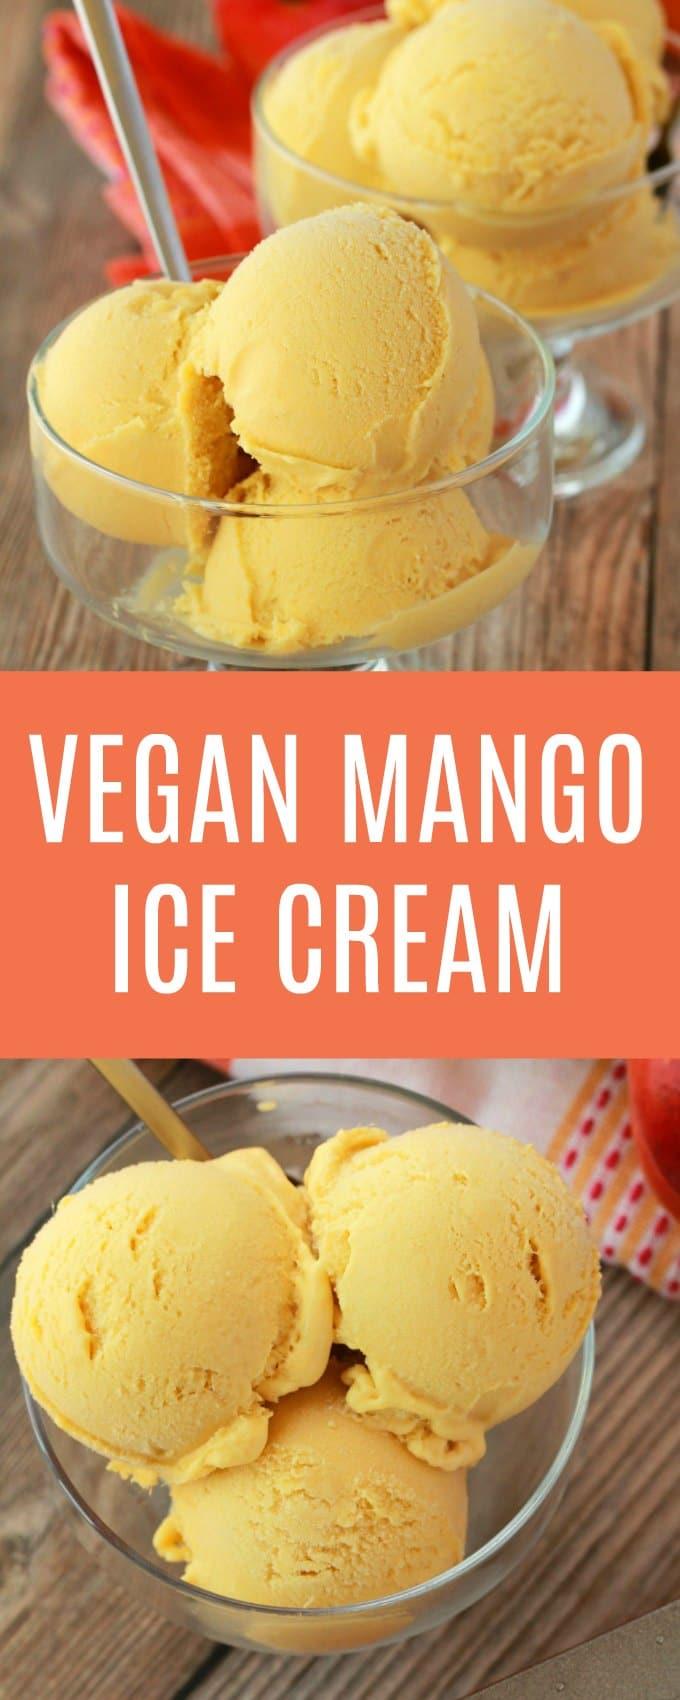 Creamy and divinely textured vegan mango ice cream. This easy 5-ingredient recipe is perfectly sweet, a gorgeous color and has all the mango flavor you could dream of! #vegan #lovingitvegan #veganicecream #vegandessert #dairyfree #glutenfree | lovingitvegan.com